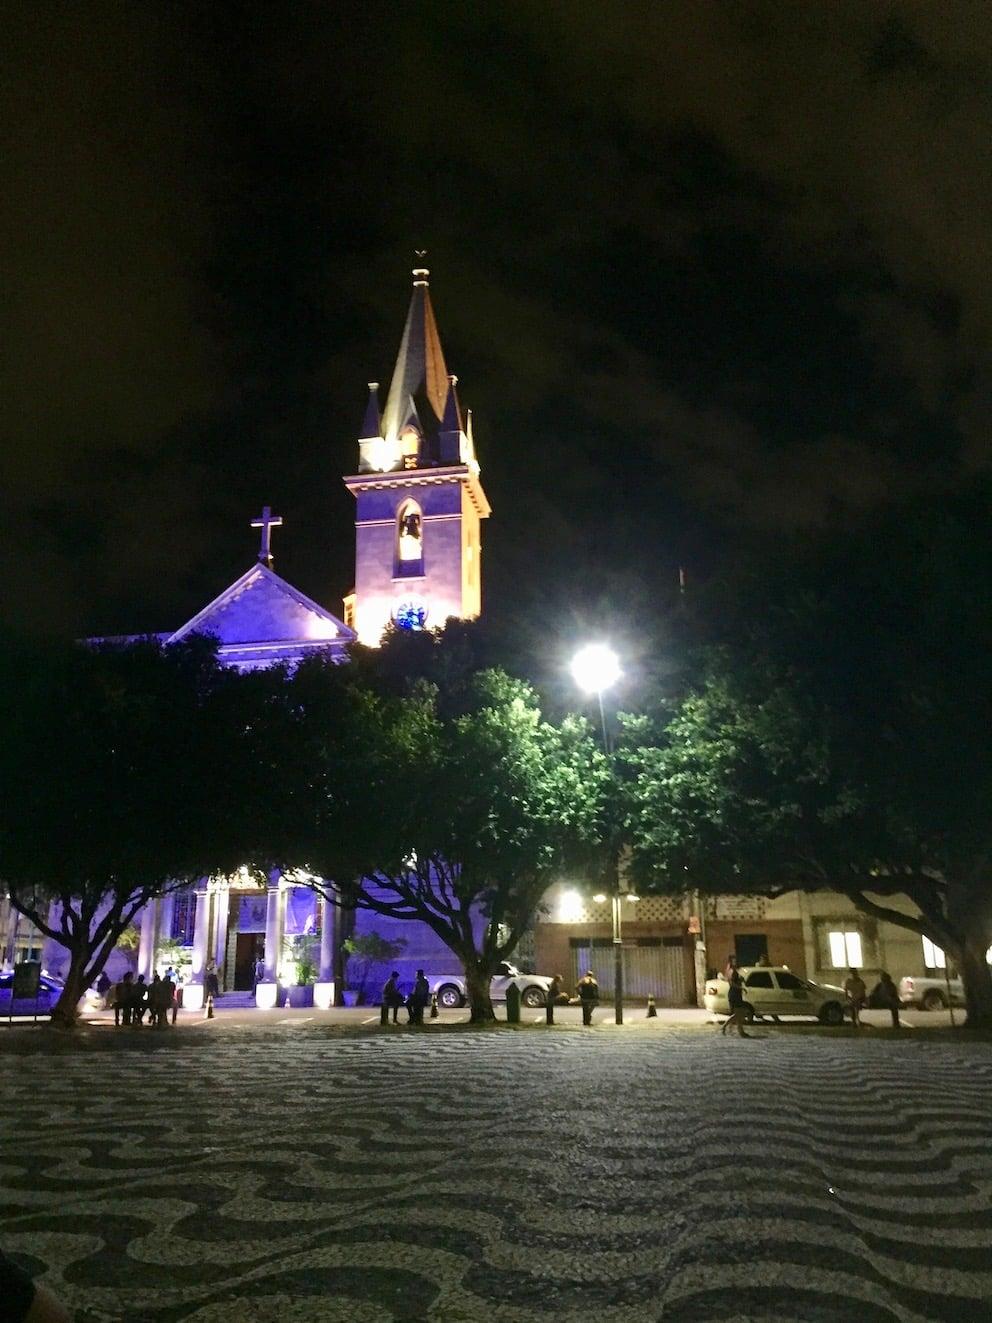 City center Manaus